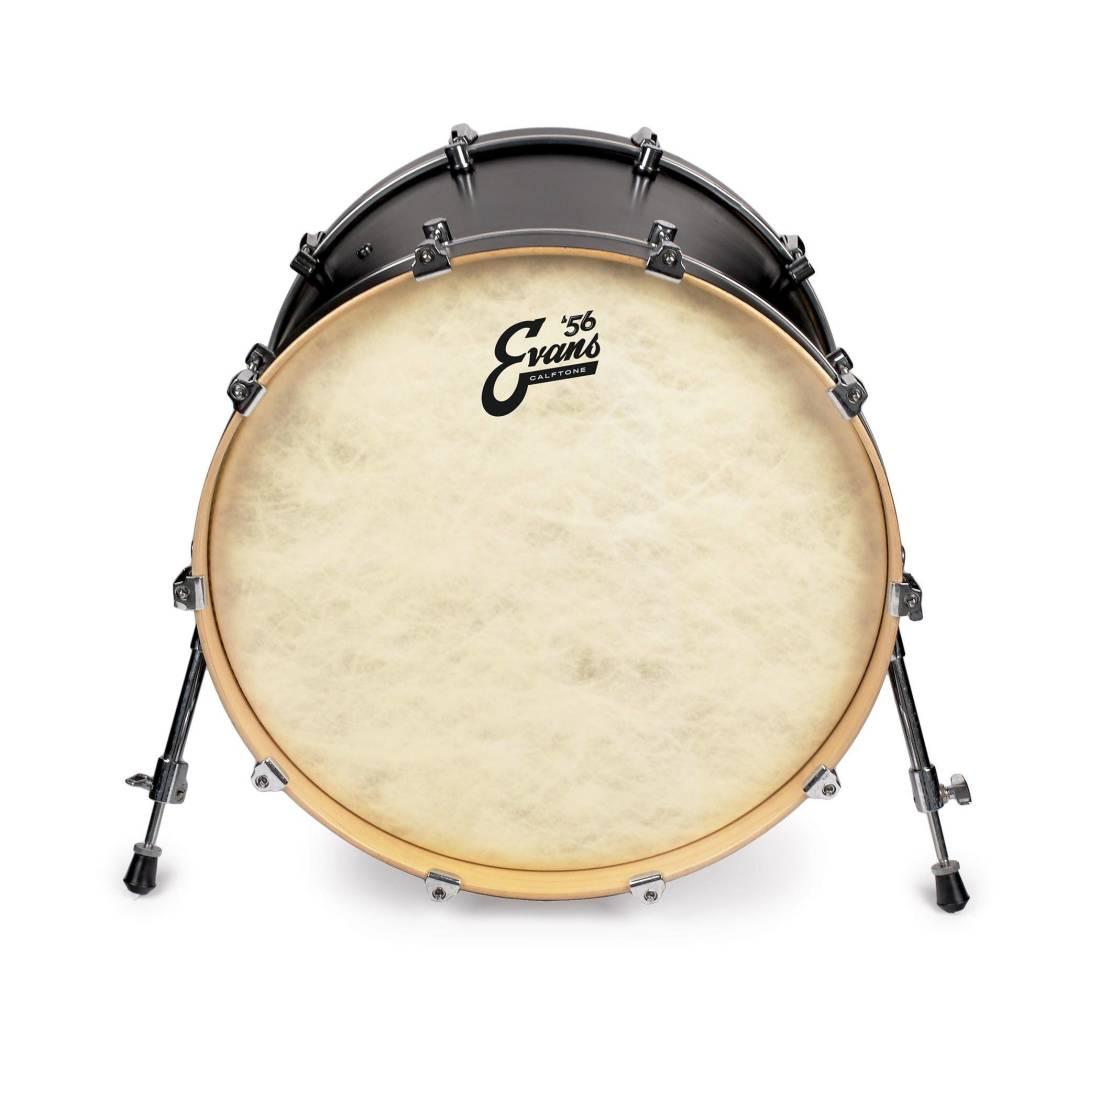 26 Bass Drum Head Used : evans calftone bass drum head 26 inch long mcquade musical instruments ~ Russianpoet.info Haus und Dekorationen